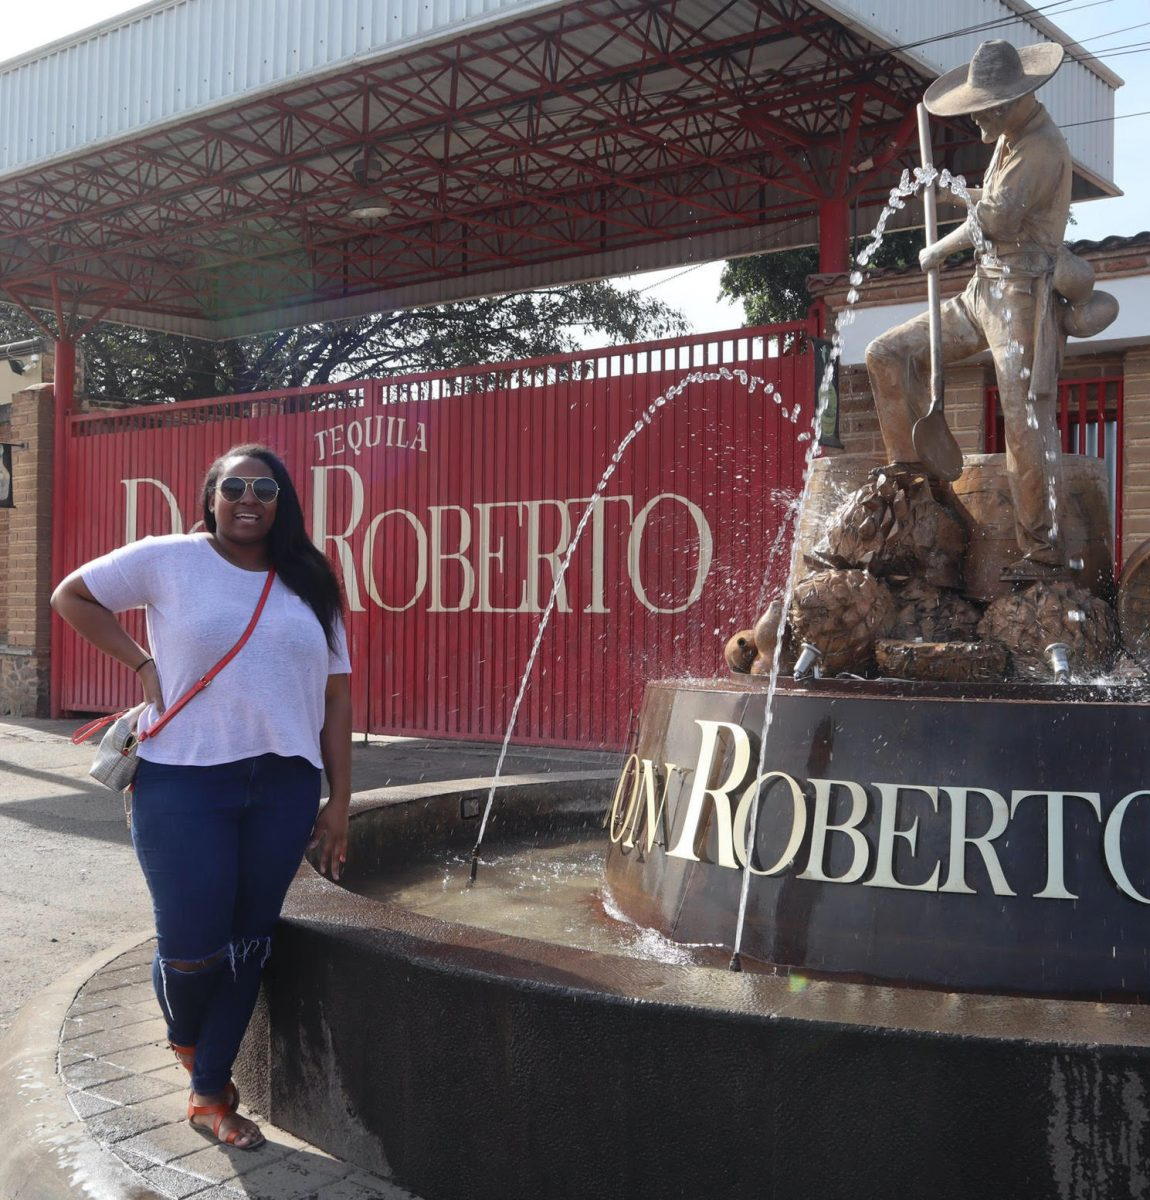 Rikki Kelly at Casa Don Roberto